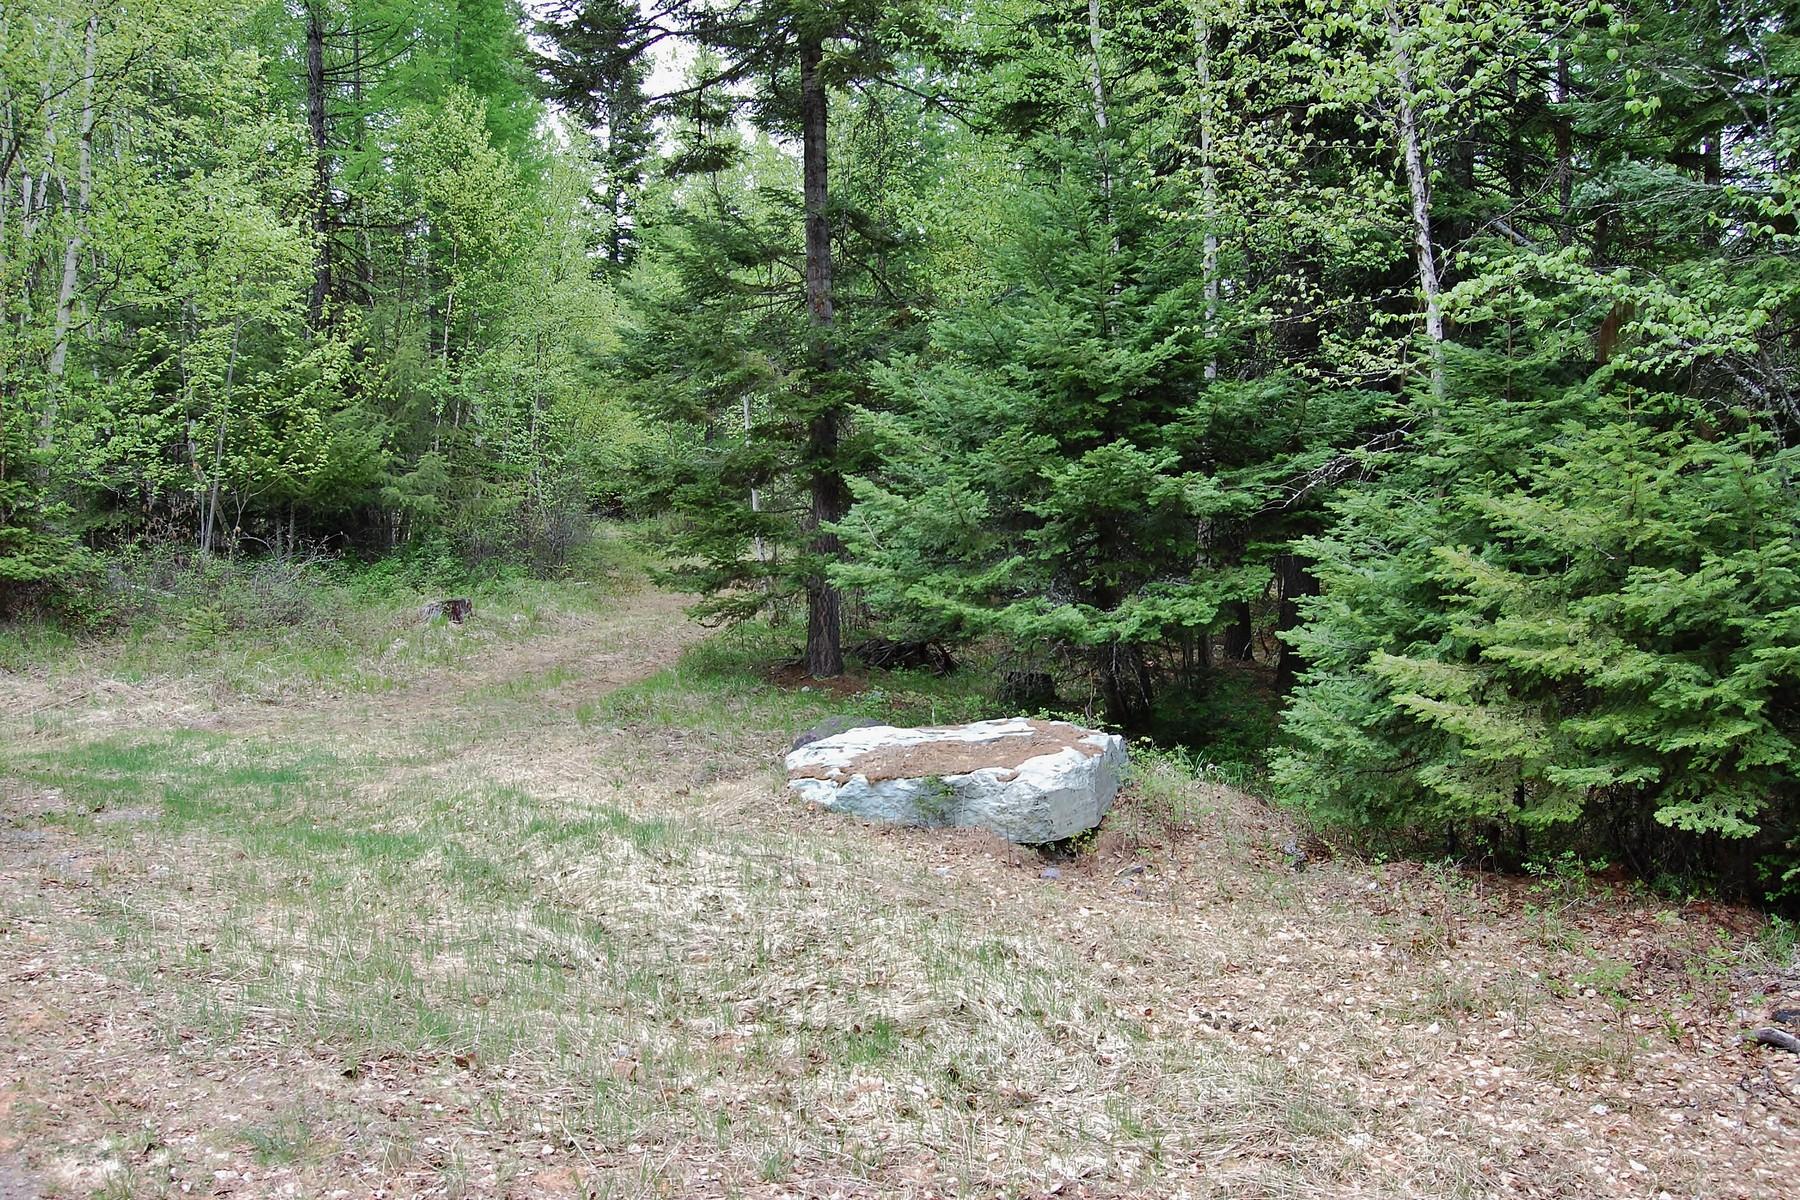 Additional photo for property listing at nhn Big Hawk Drive, Lot 10, Bigfork, MT 59911 Lot 10  Wapiti Dr Lot 10 Bigfork, Montana 59911 United States